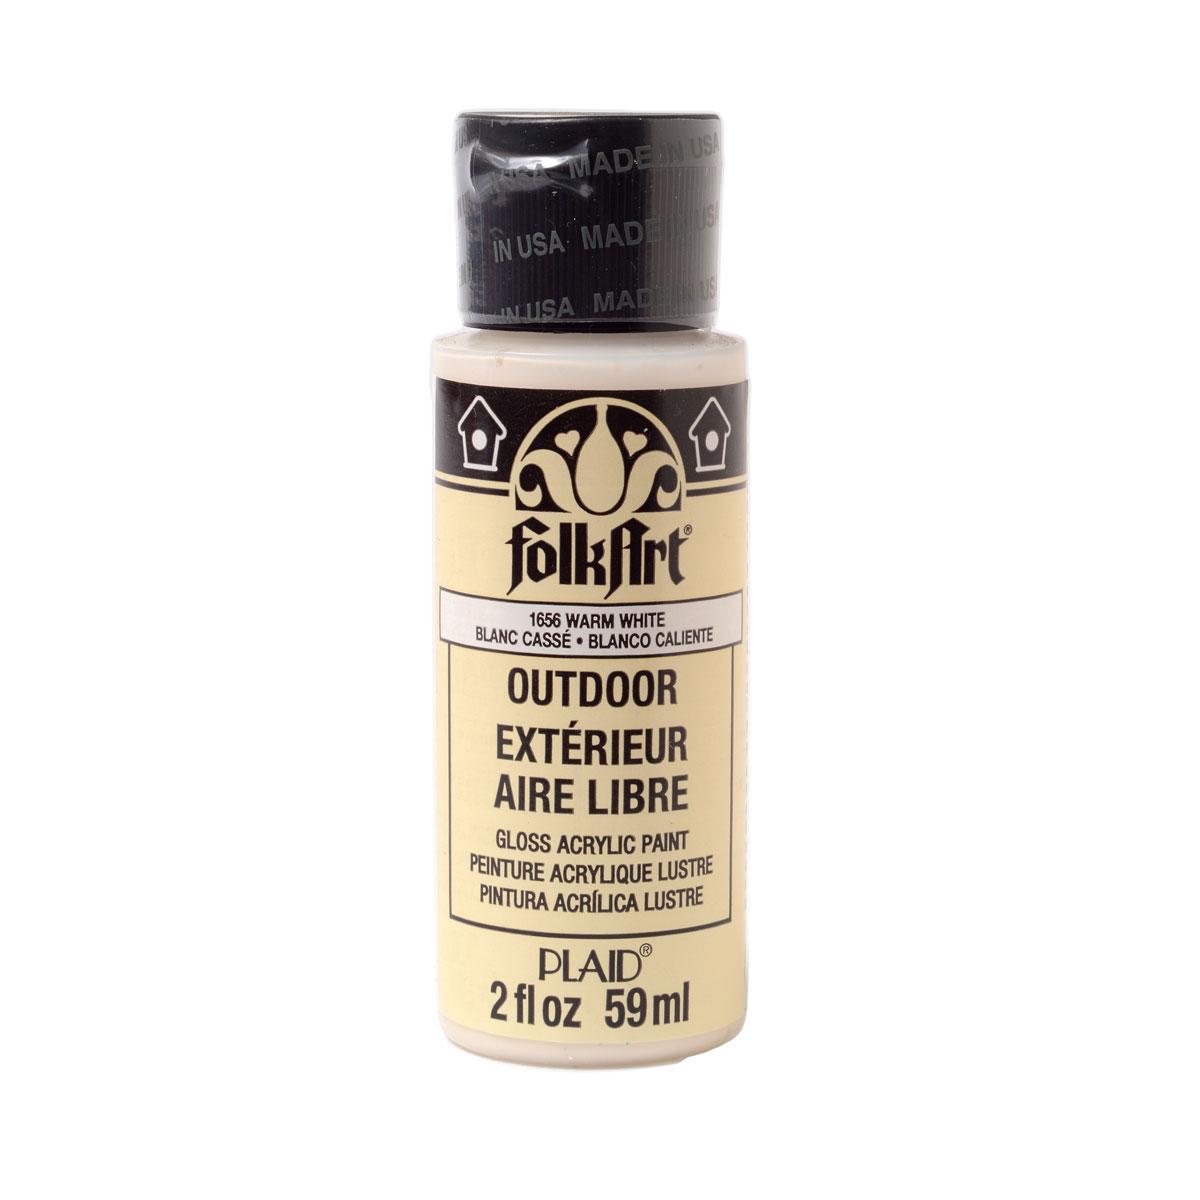 FolkArt ® Outdoor™ Acrylic Colors - Warm White, 2 oz. - 1656